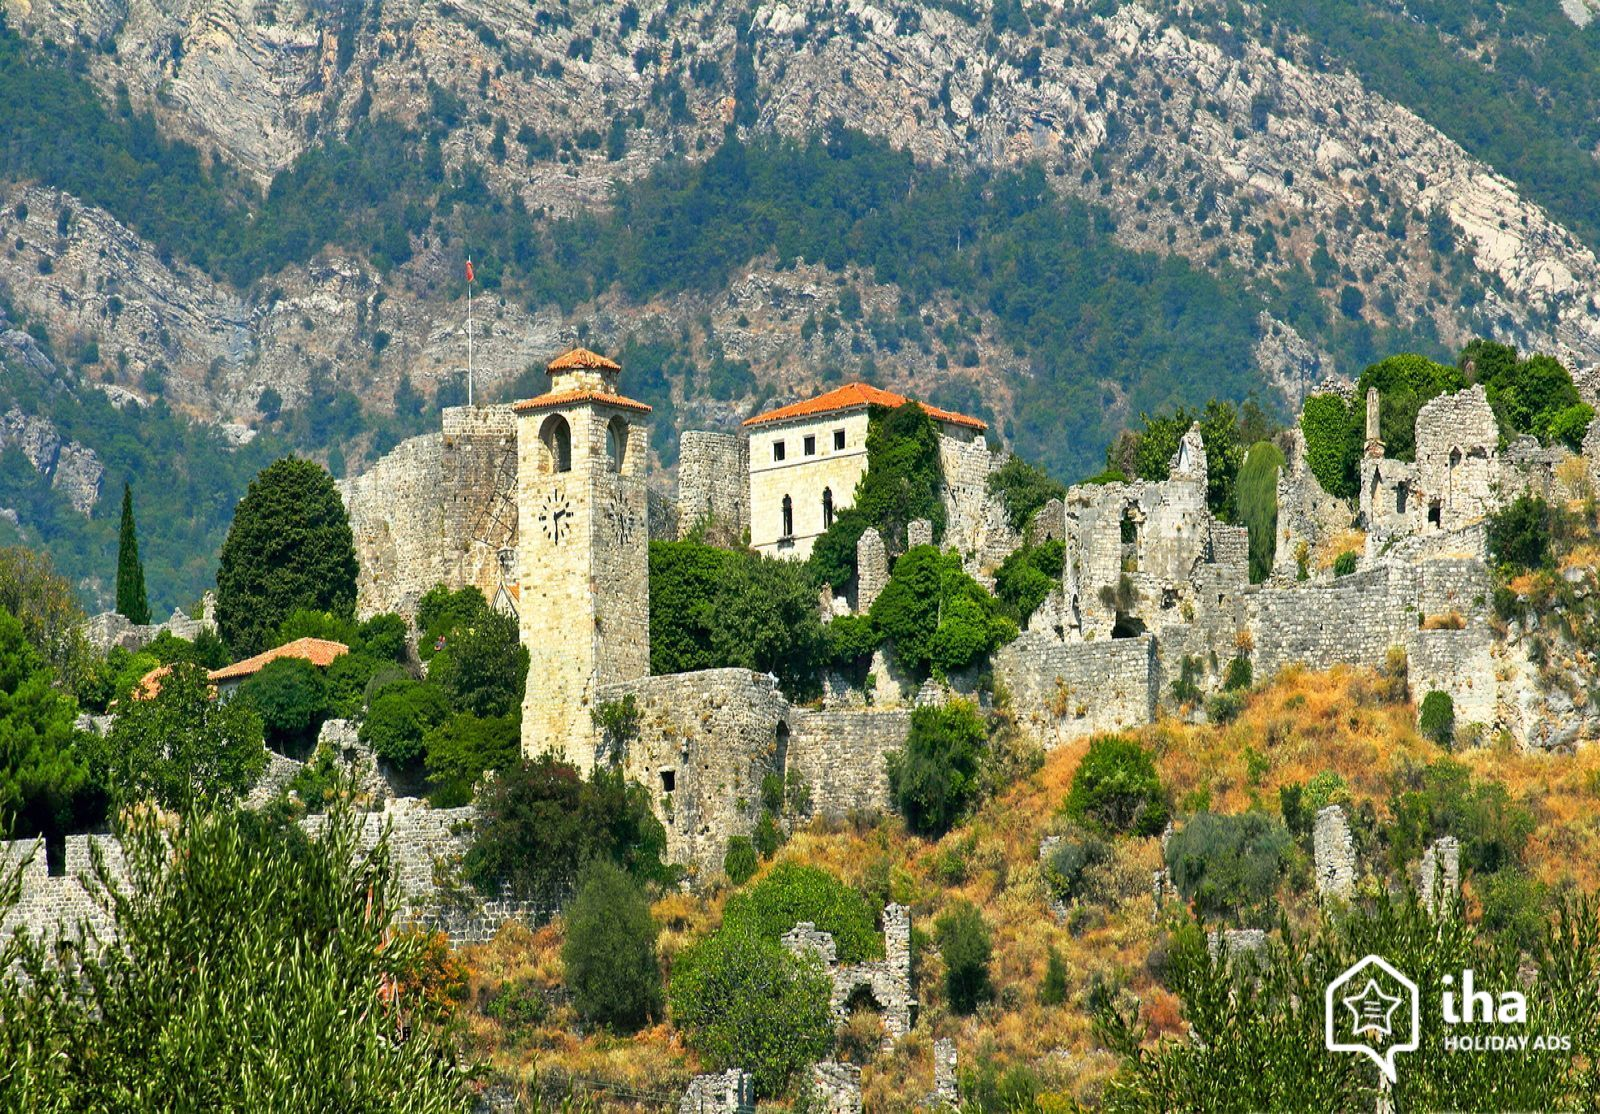 European Road Haulage Montenegro.